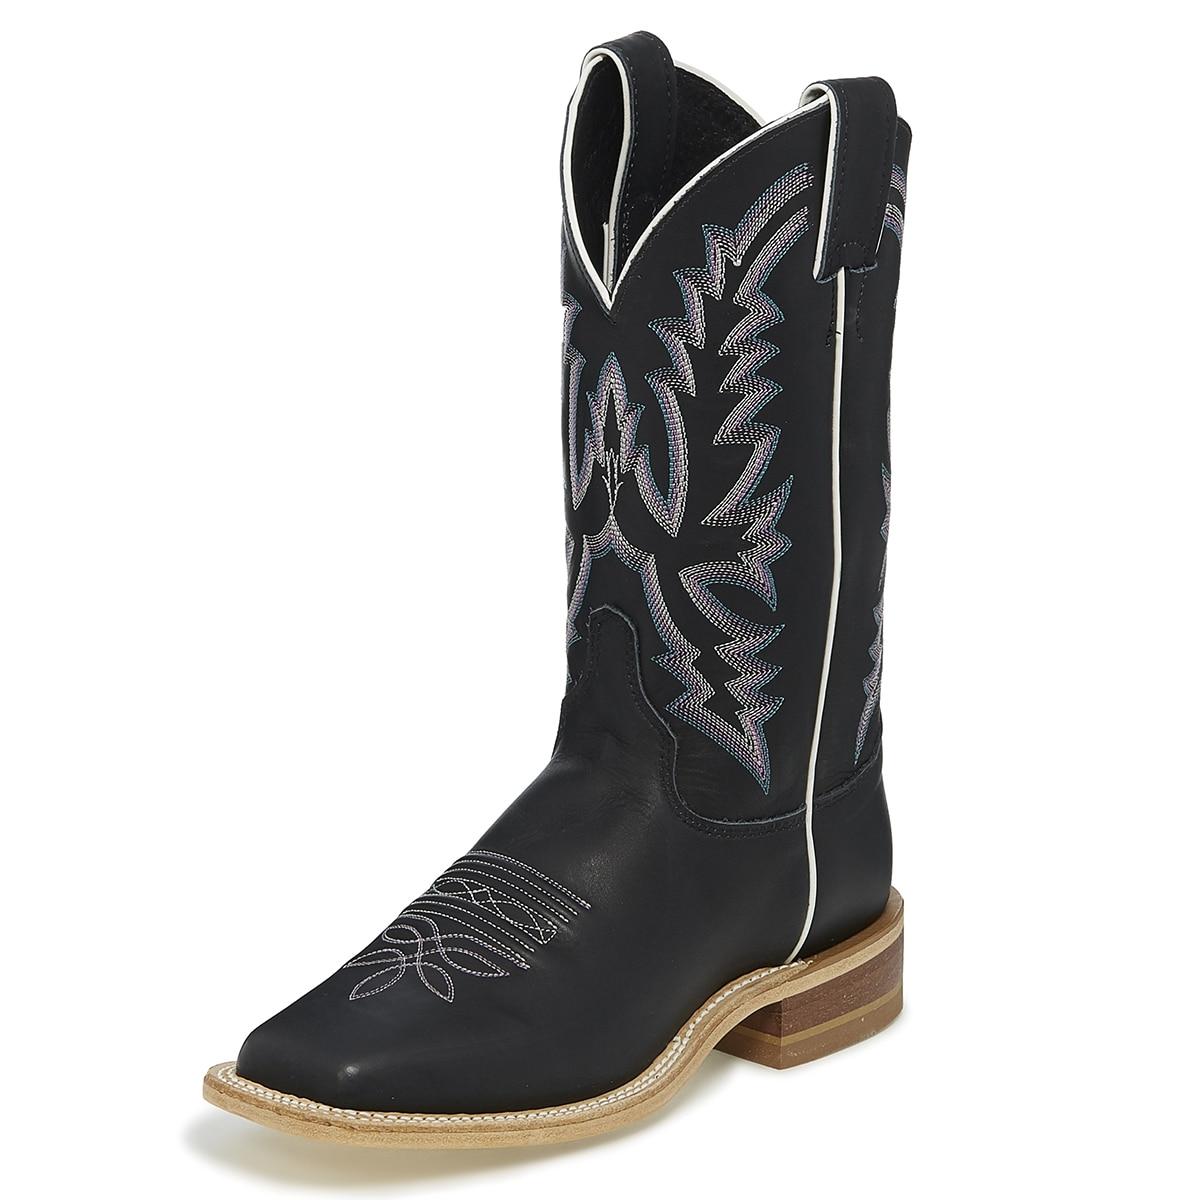 Justin Women's Bent Rail Kenedy Boots - Black